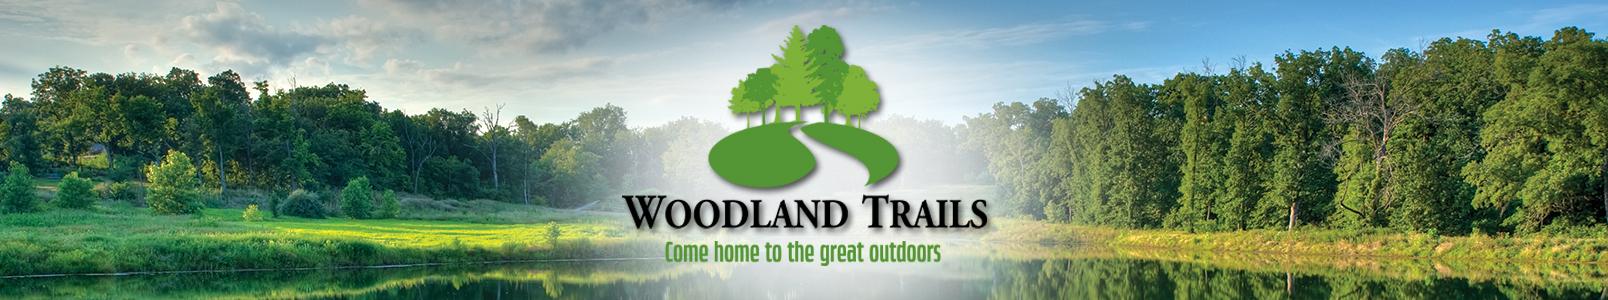 Woodland_Trails_narrow2